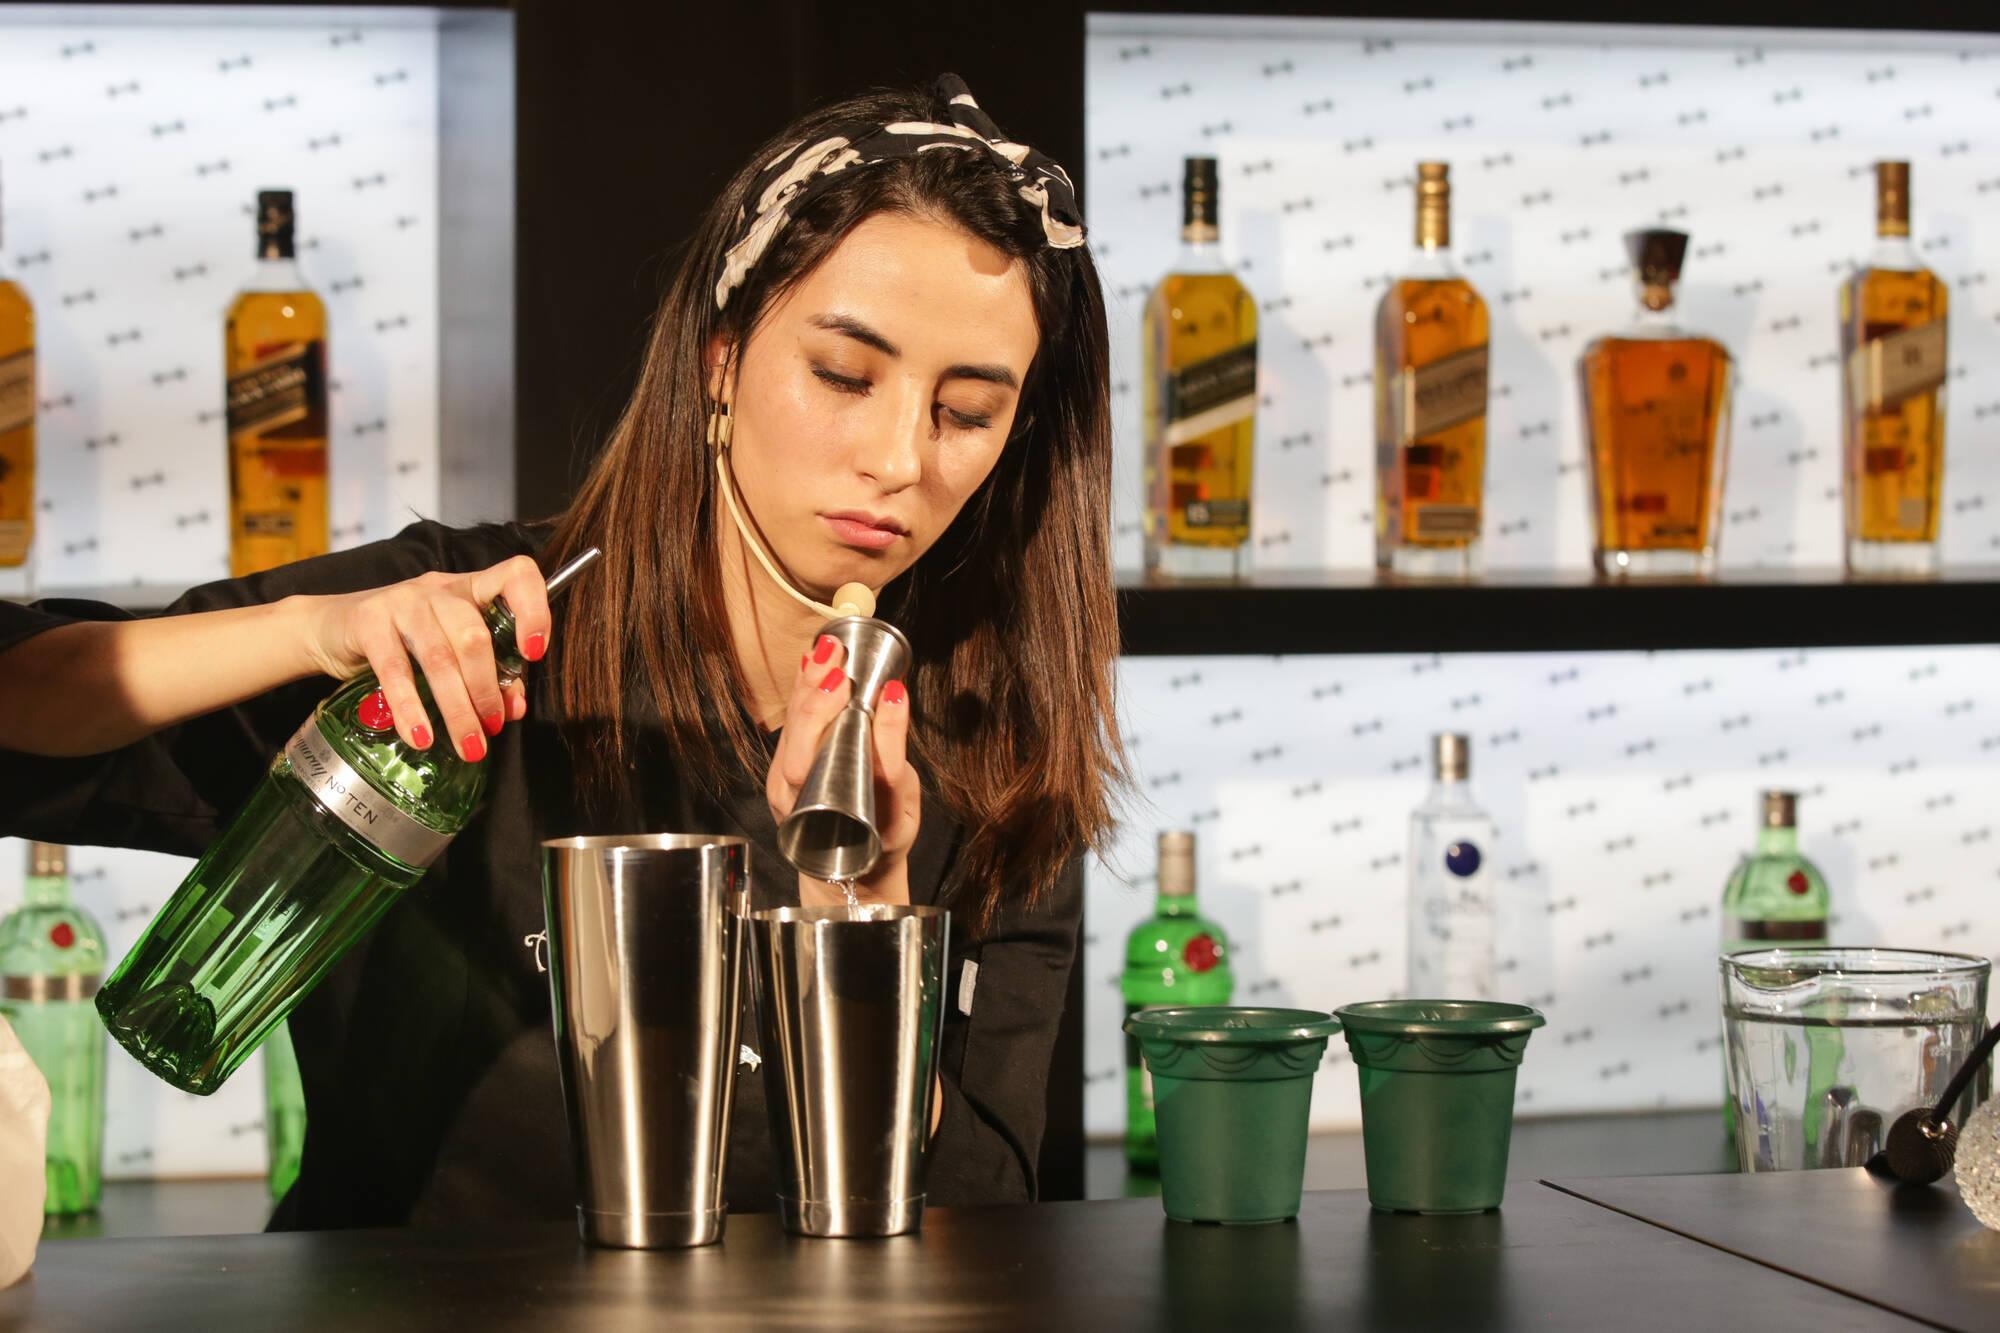 World Class Competition 2019: Carla Constanza gana en Chile